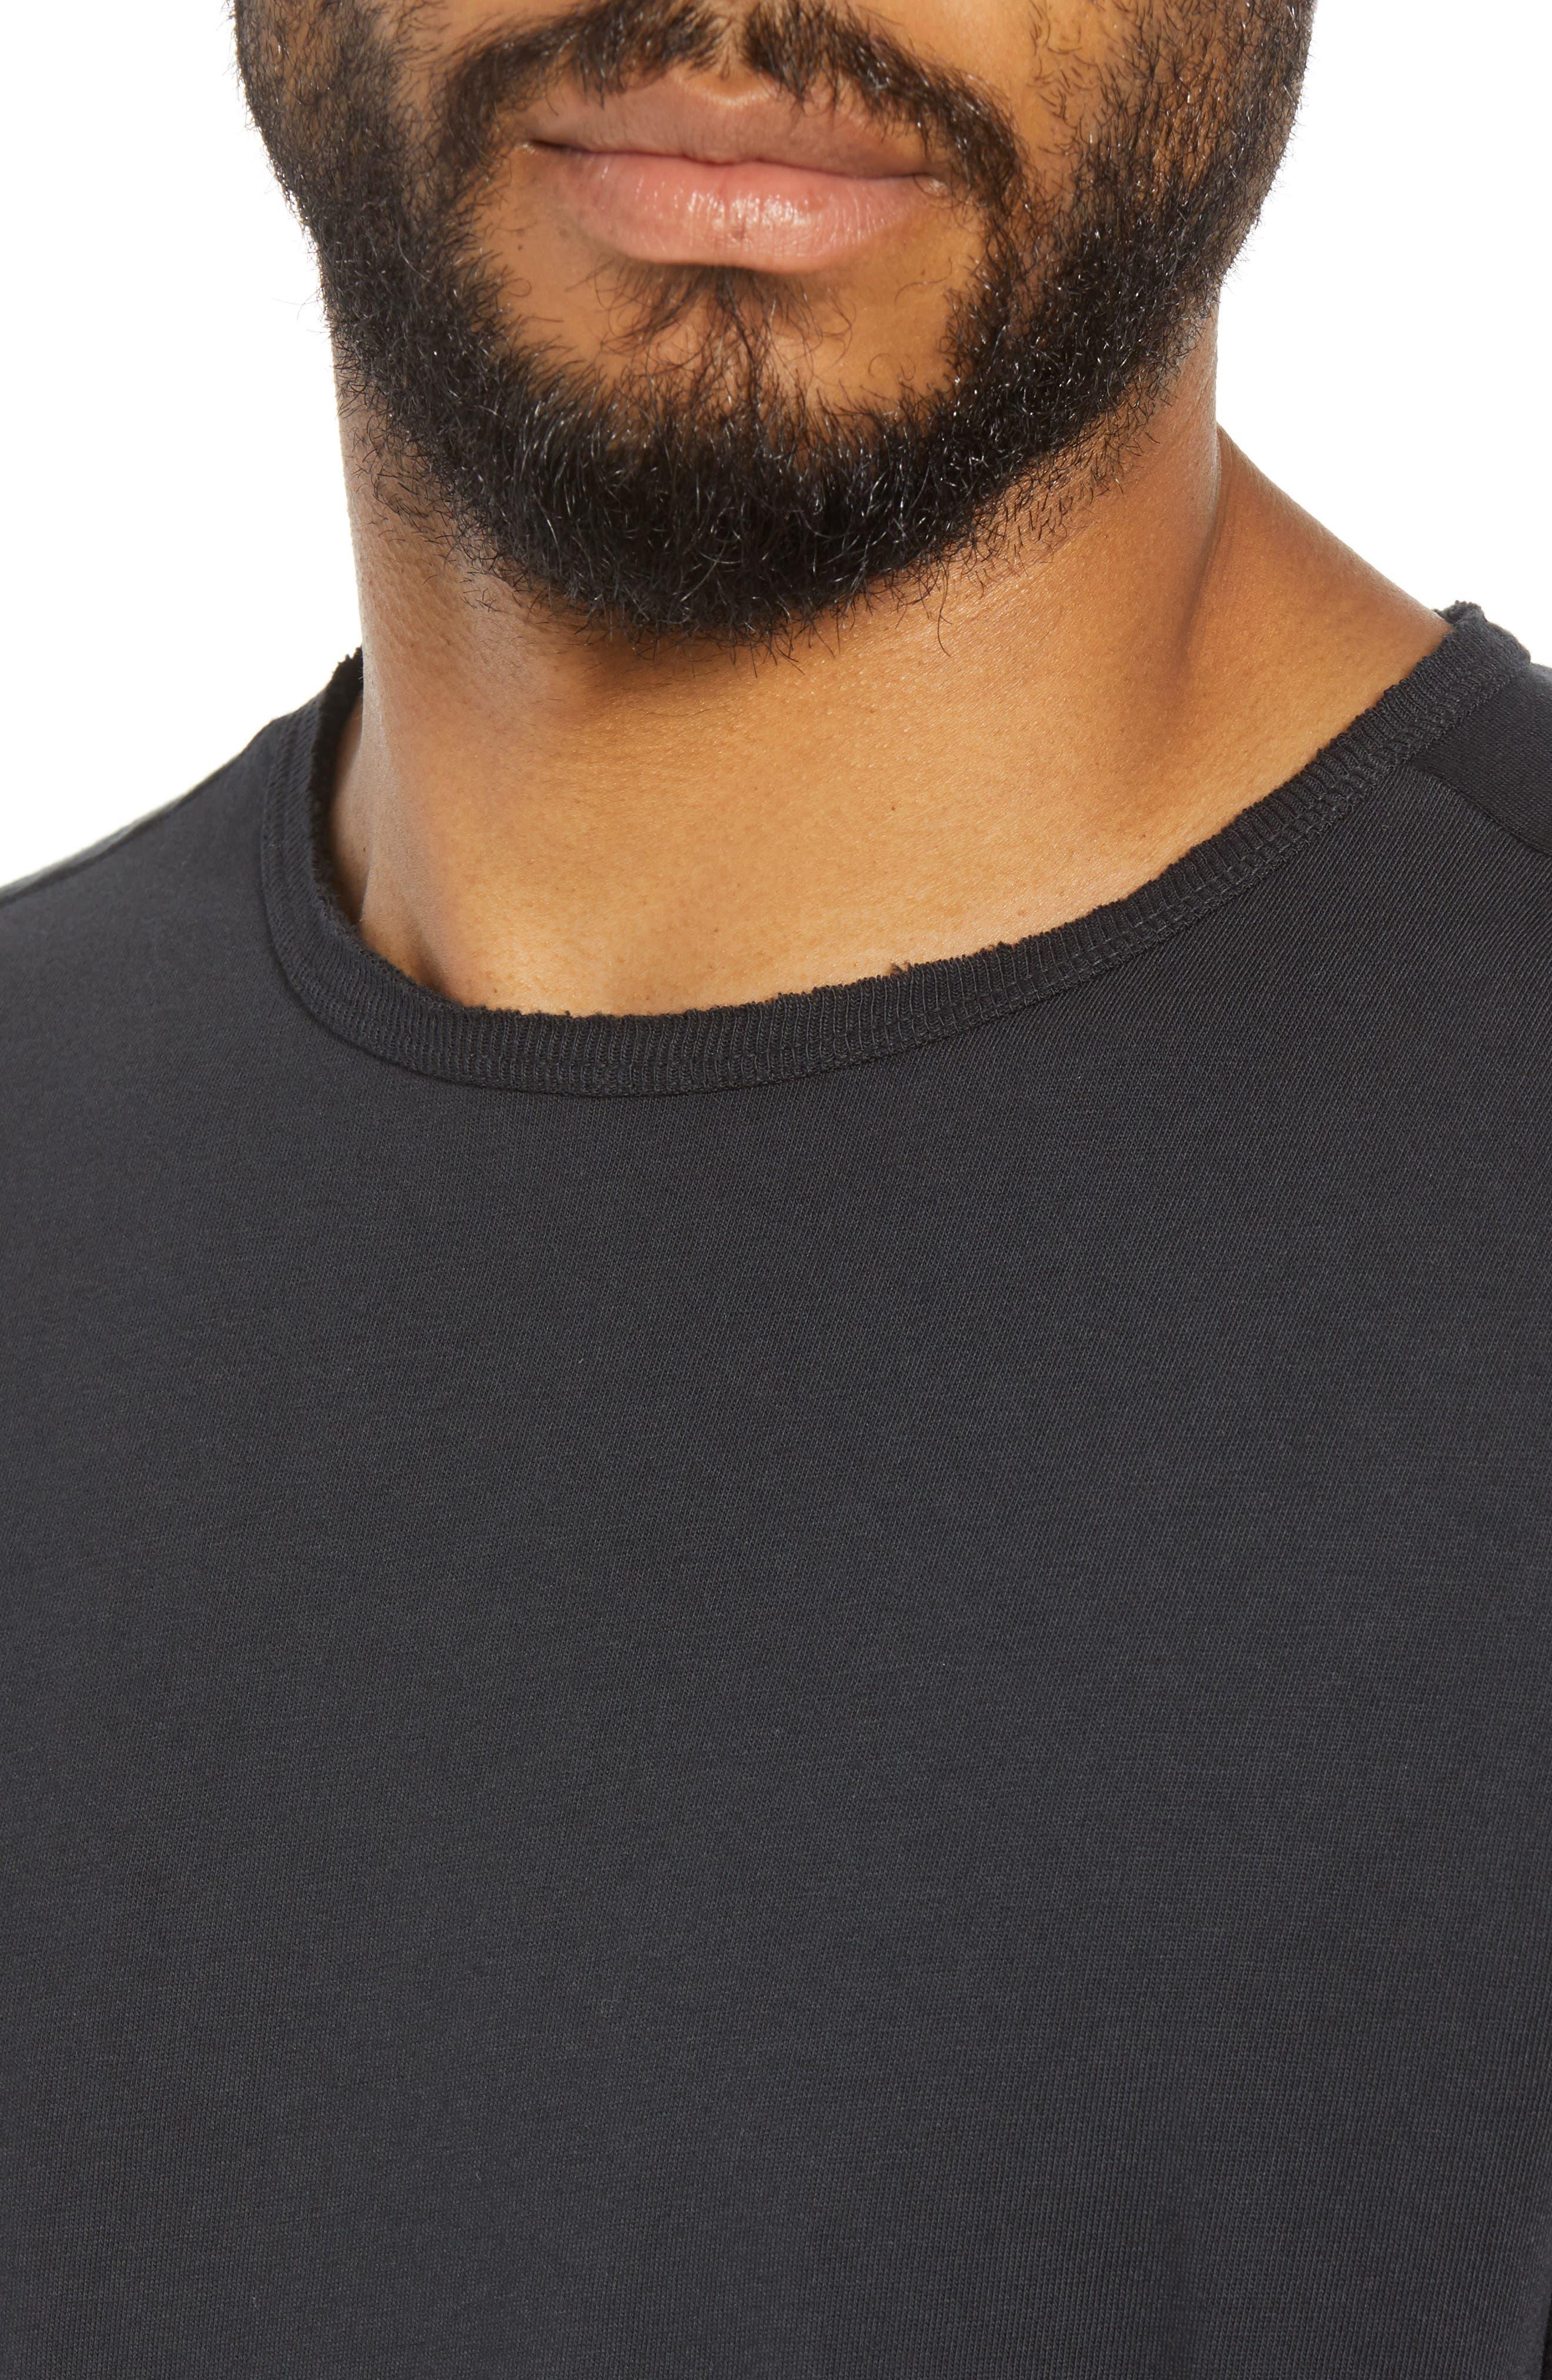 Regular Fit Elongated T-Shirt,                             Alternate thumbnail 4, color,                             BLACK